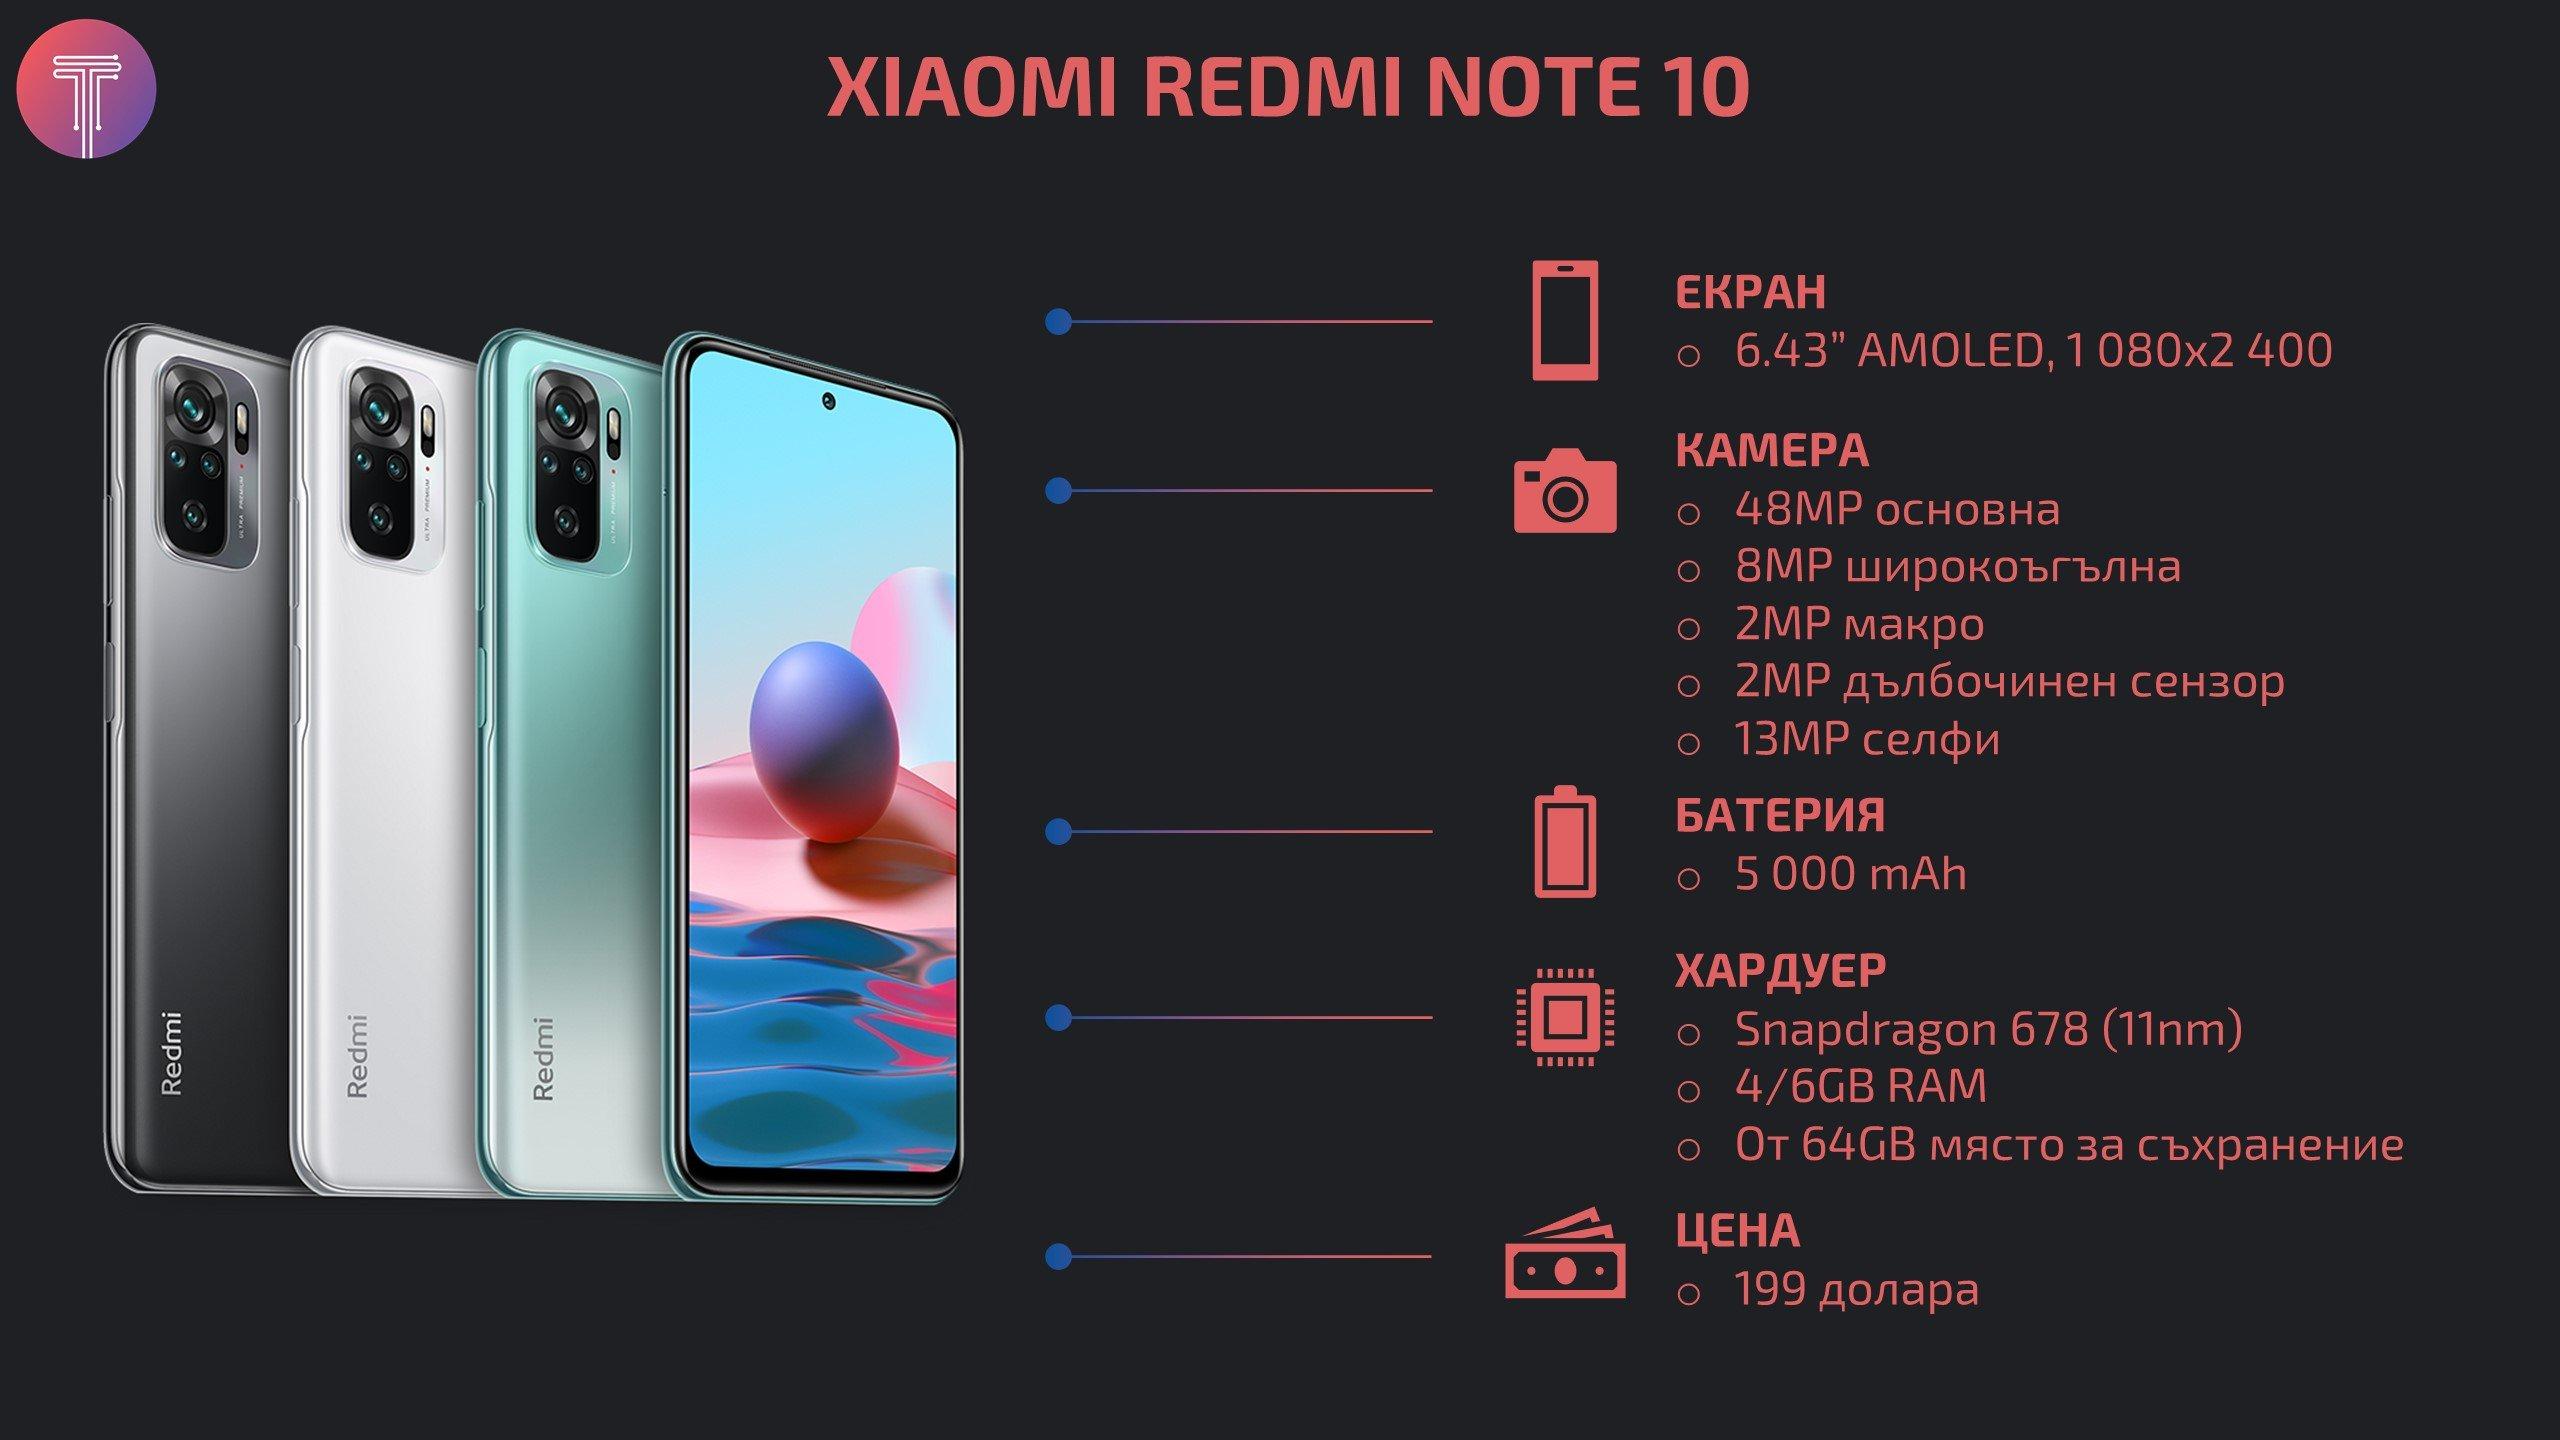 xiaomi-redmi-note-10-specs